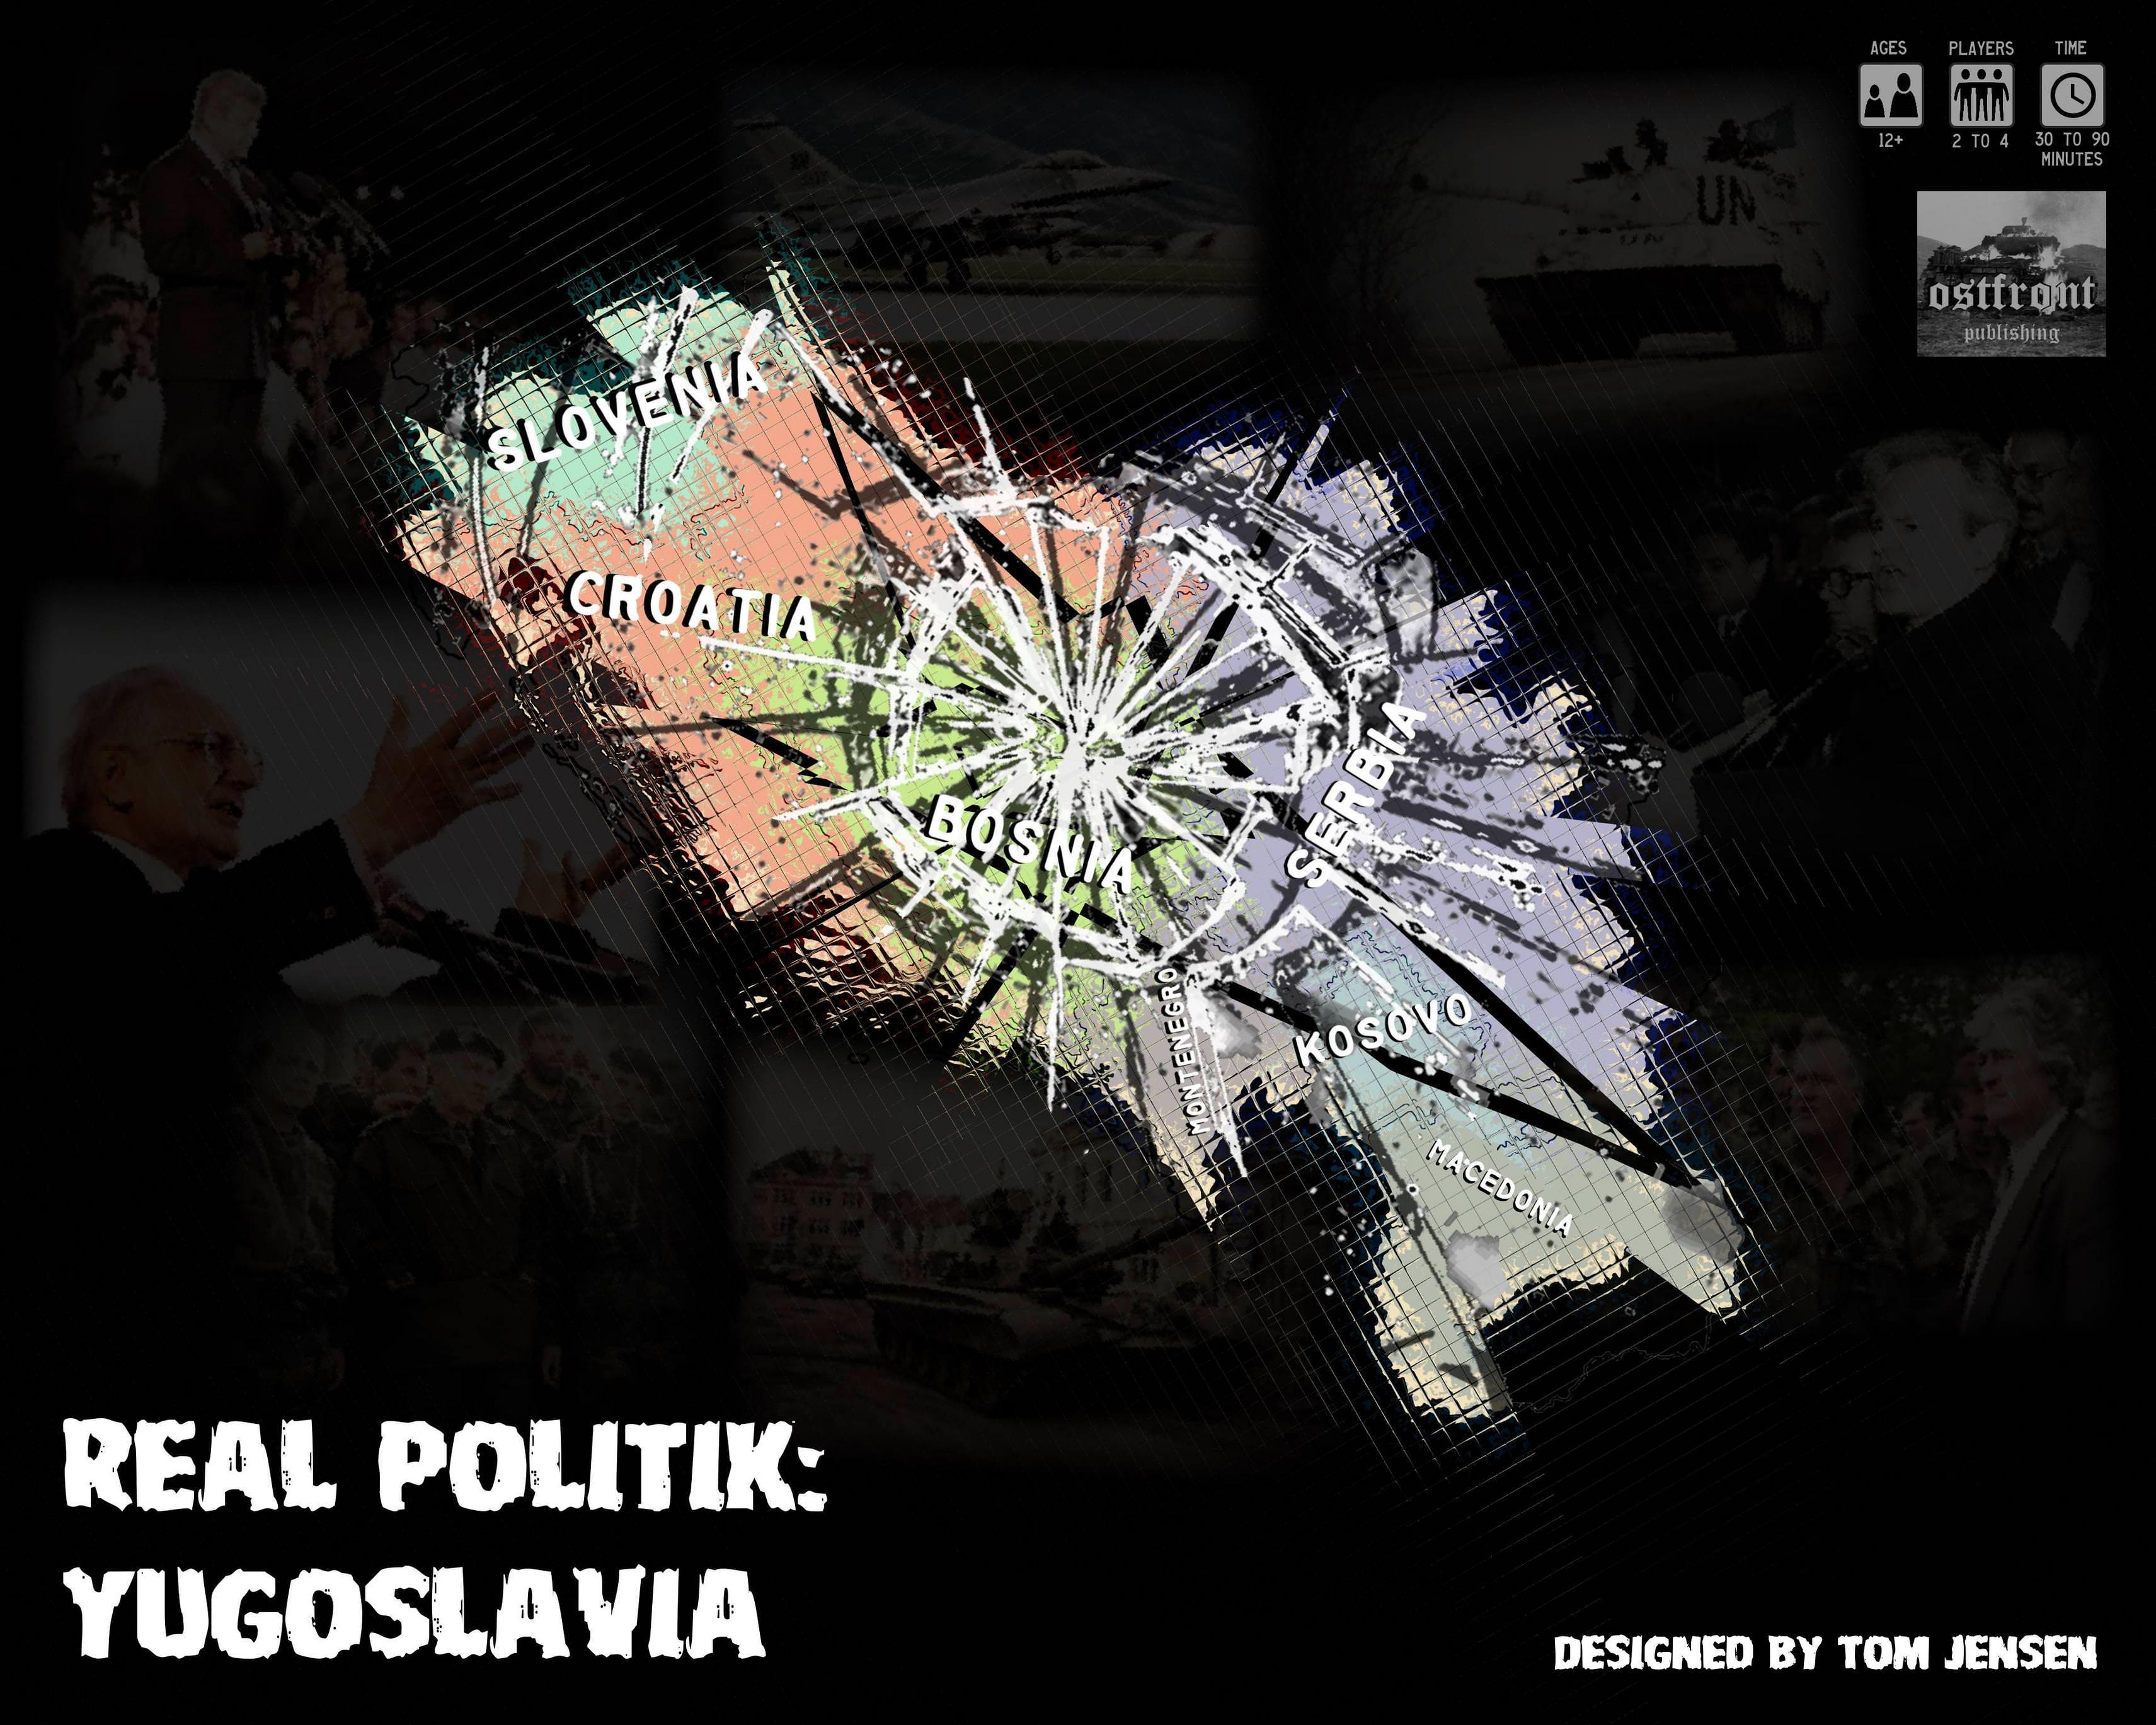 Yugoslavian wars (1991-1999)